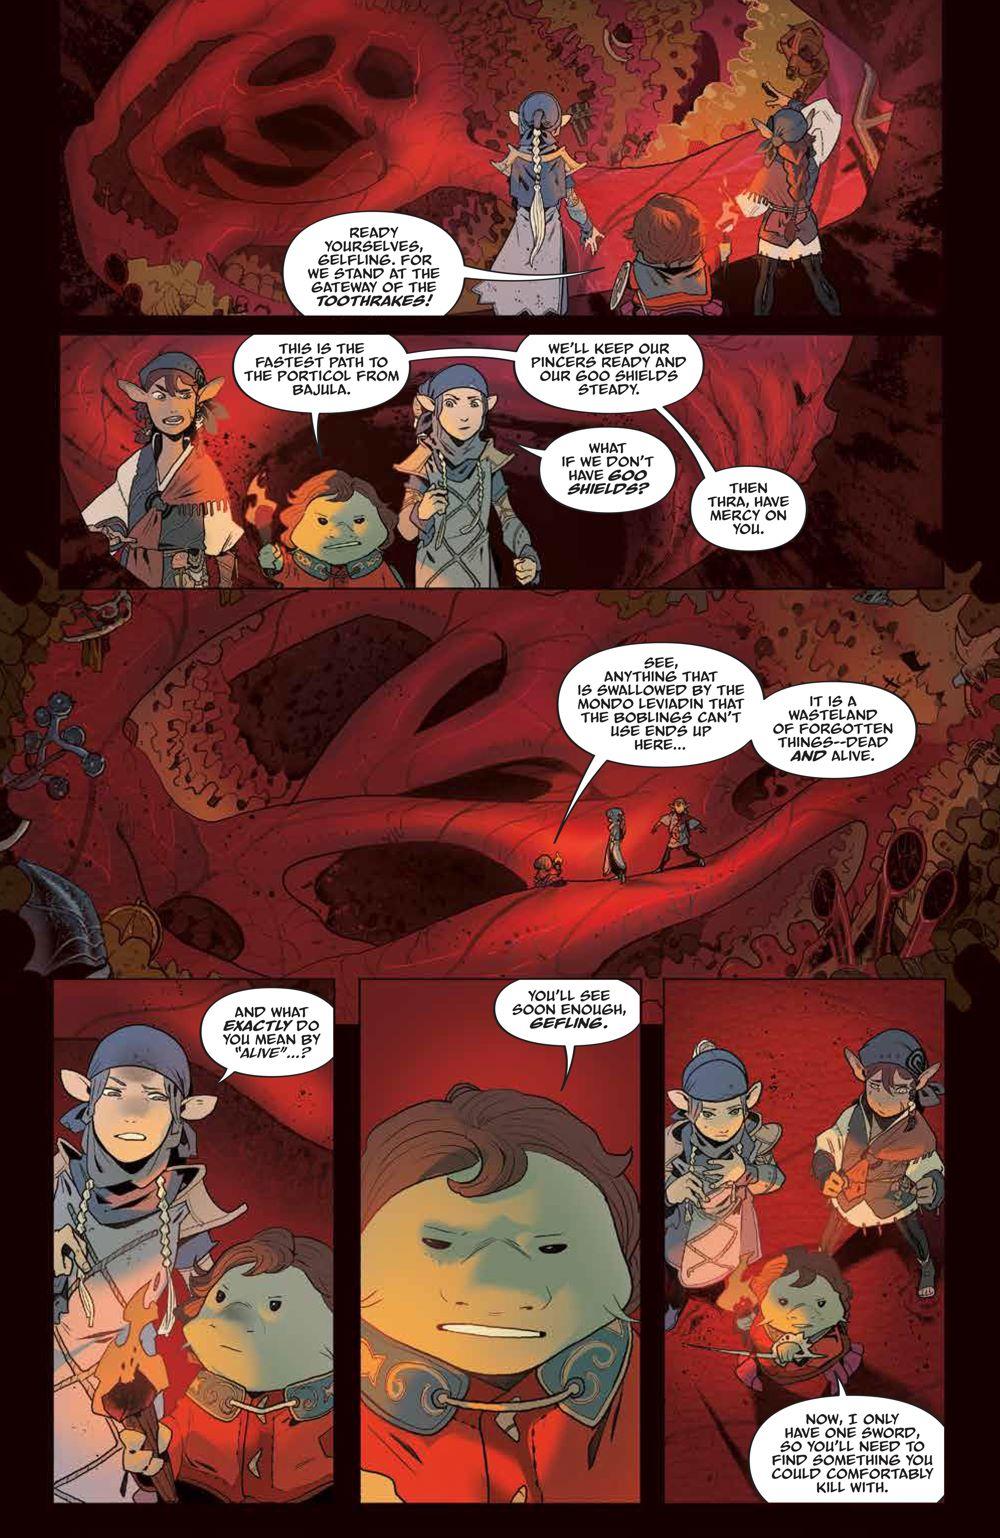 DarkCrystal_AgeResistance_011_PRESS_3 ComicList Previews: JIM HENSON'S THE DARK CRYSTAL AGE OF RESISTANCE #11